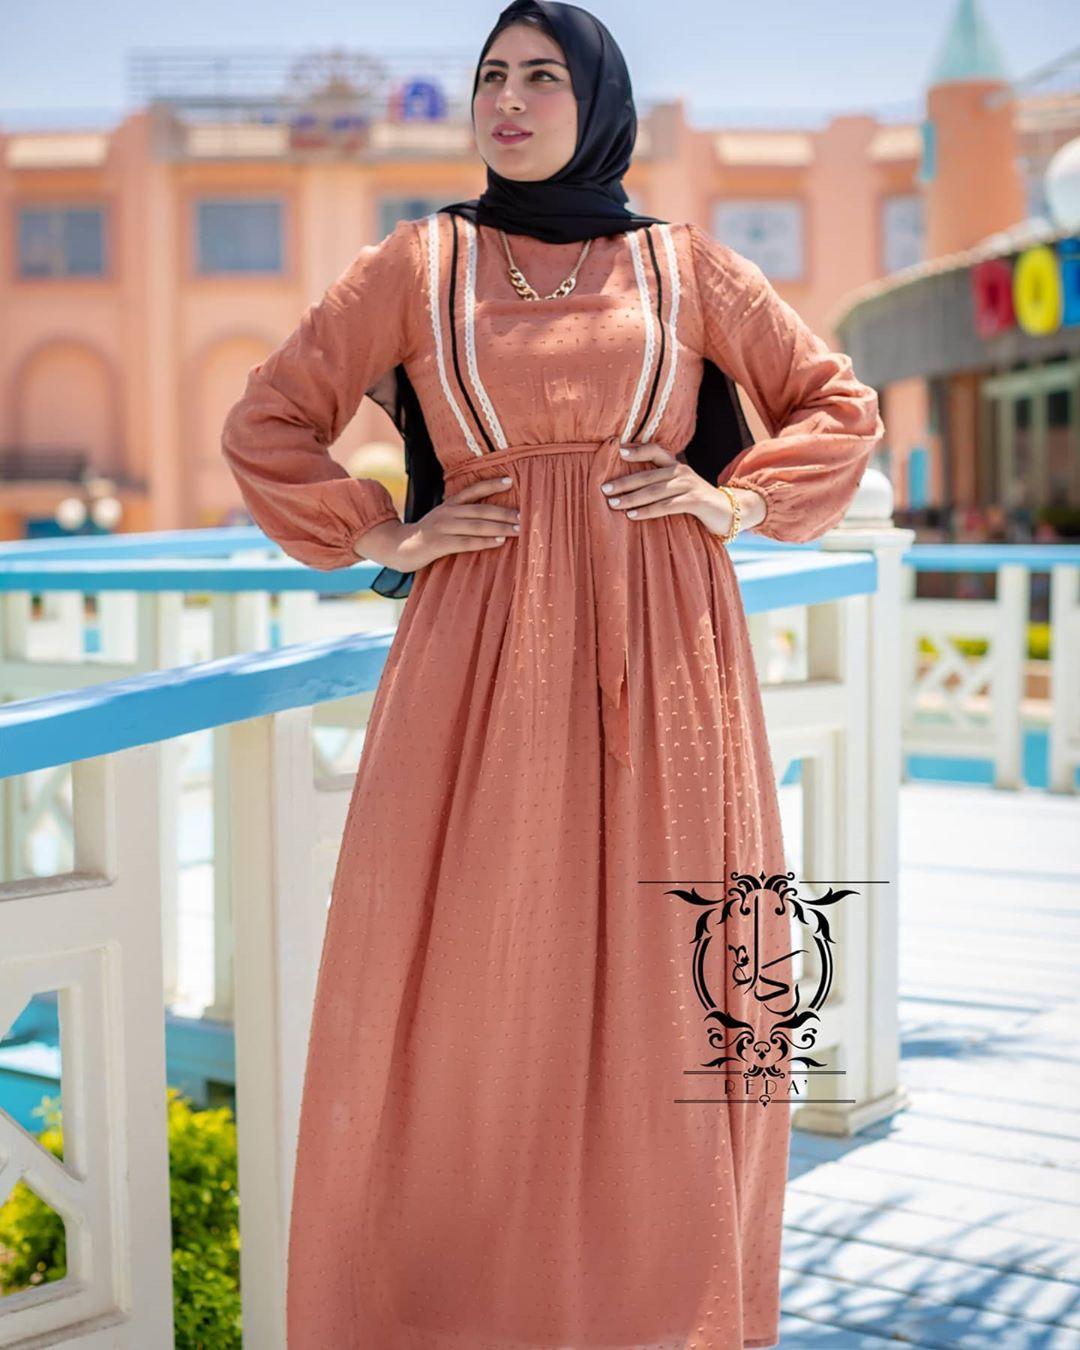 Reda رداء On Instagram لون جديد بديزاين جديد ف رداء متوفر ف الفروع وتقدروا تطلبوه اونلاين Fashion Hijab Outfit Outfits